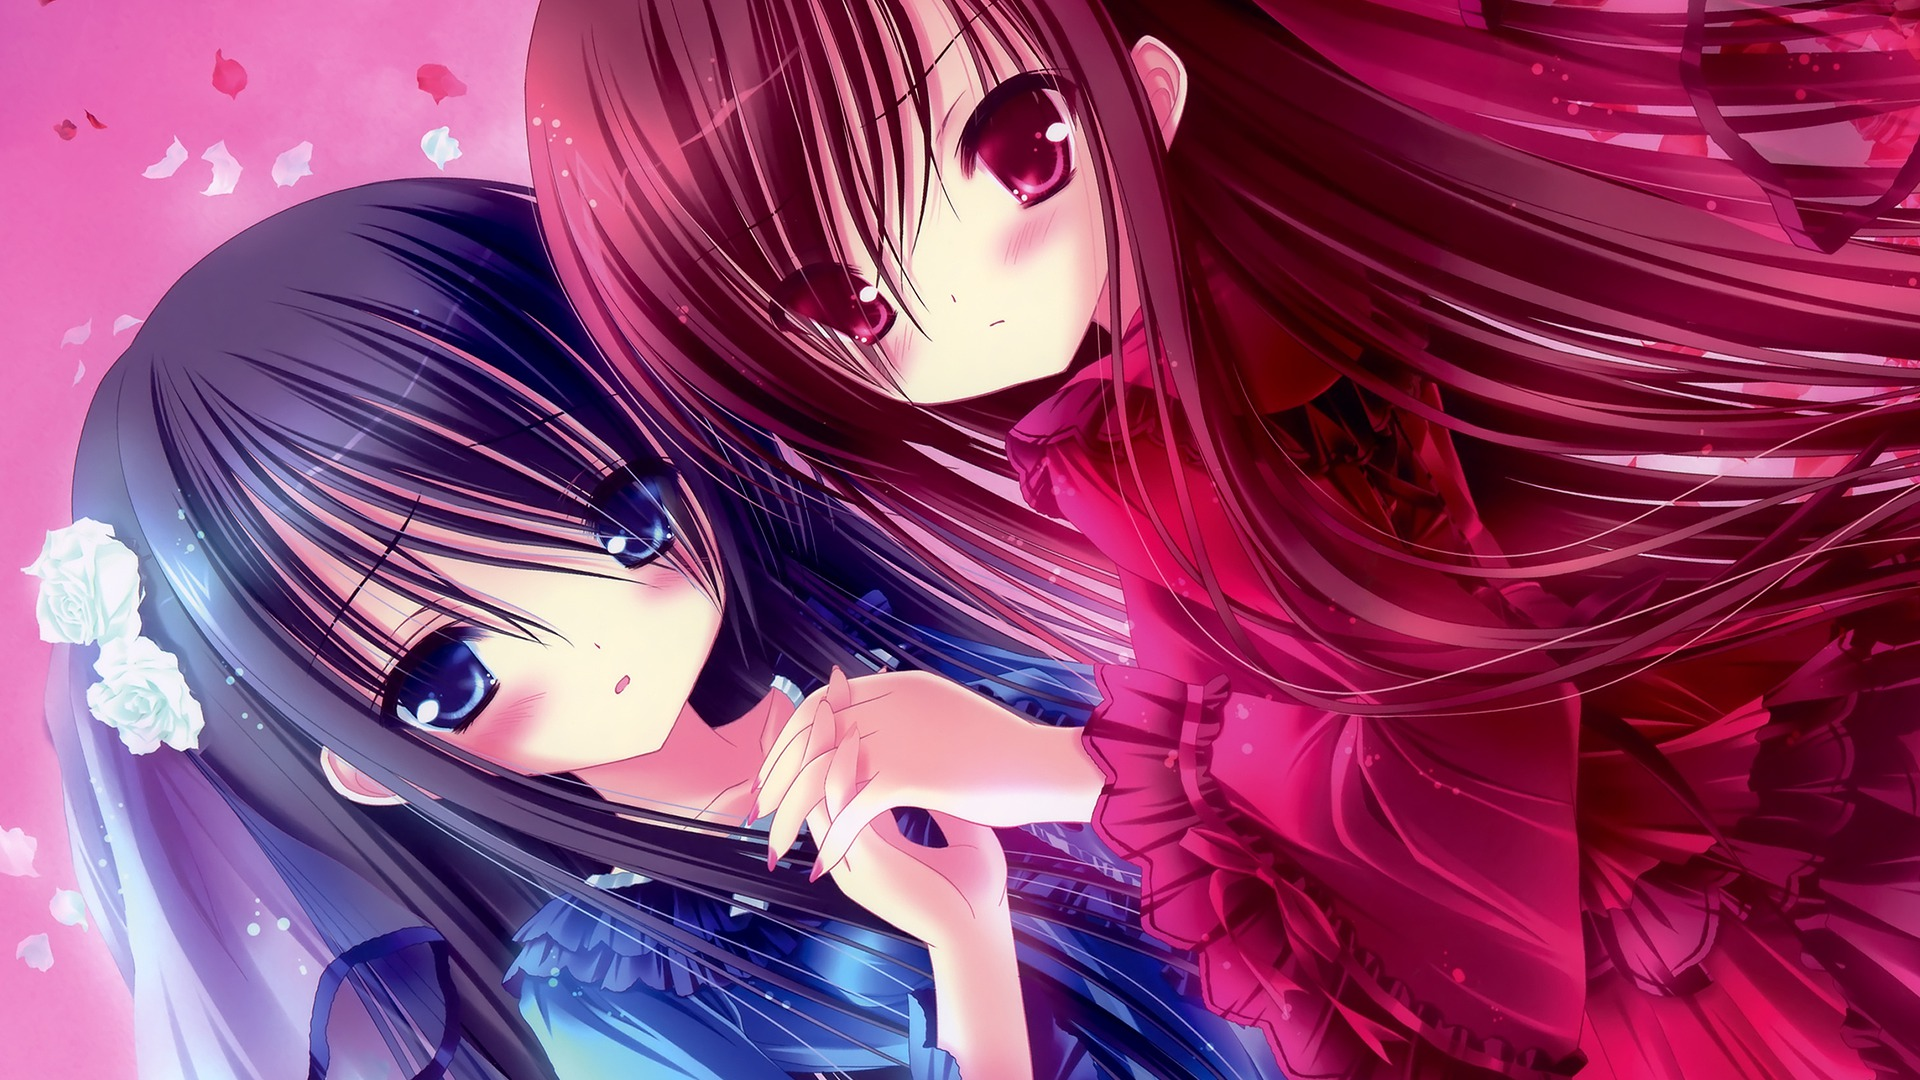 Cute Anime Wallpapers HD